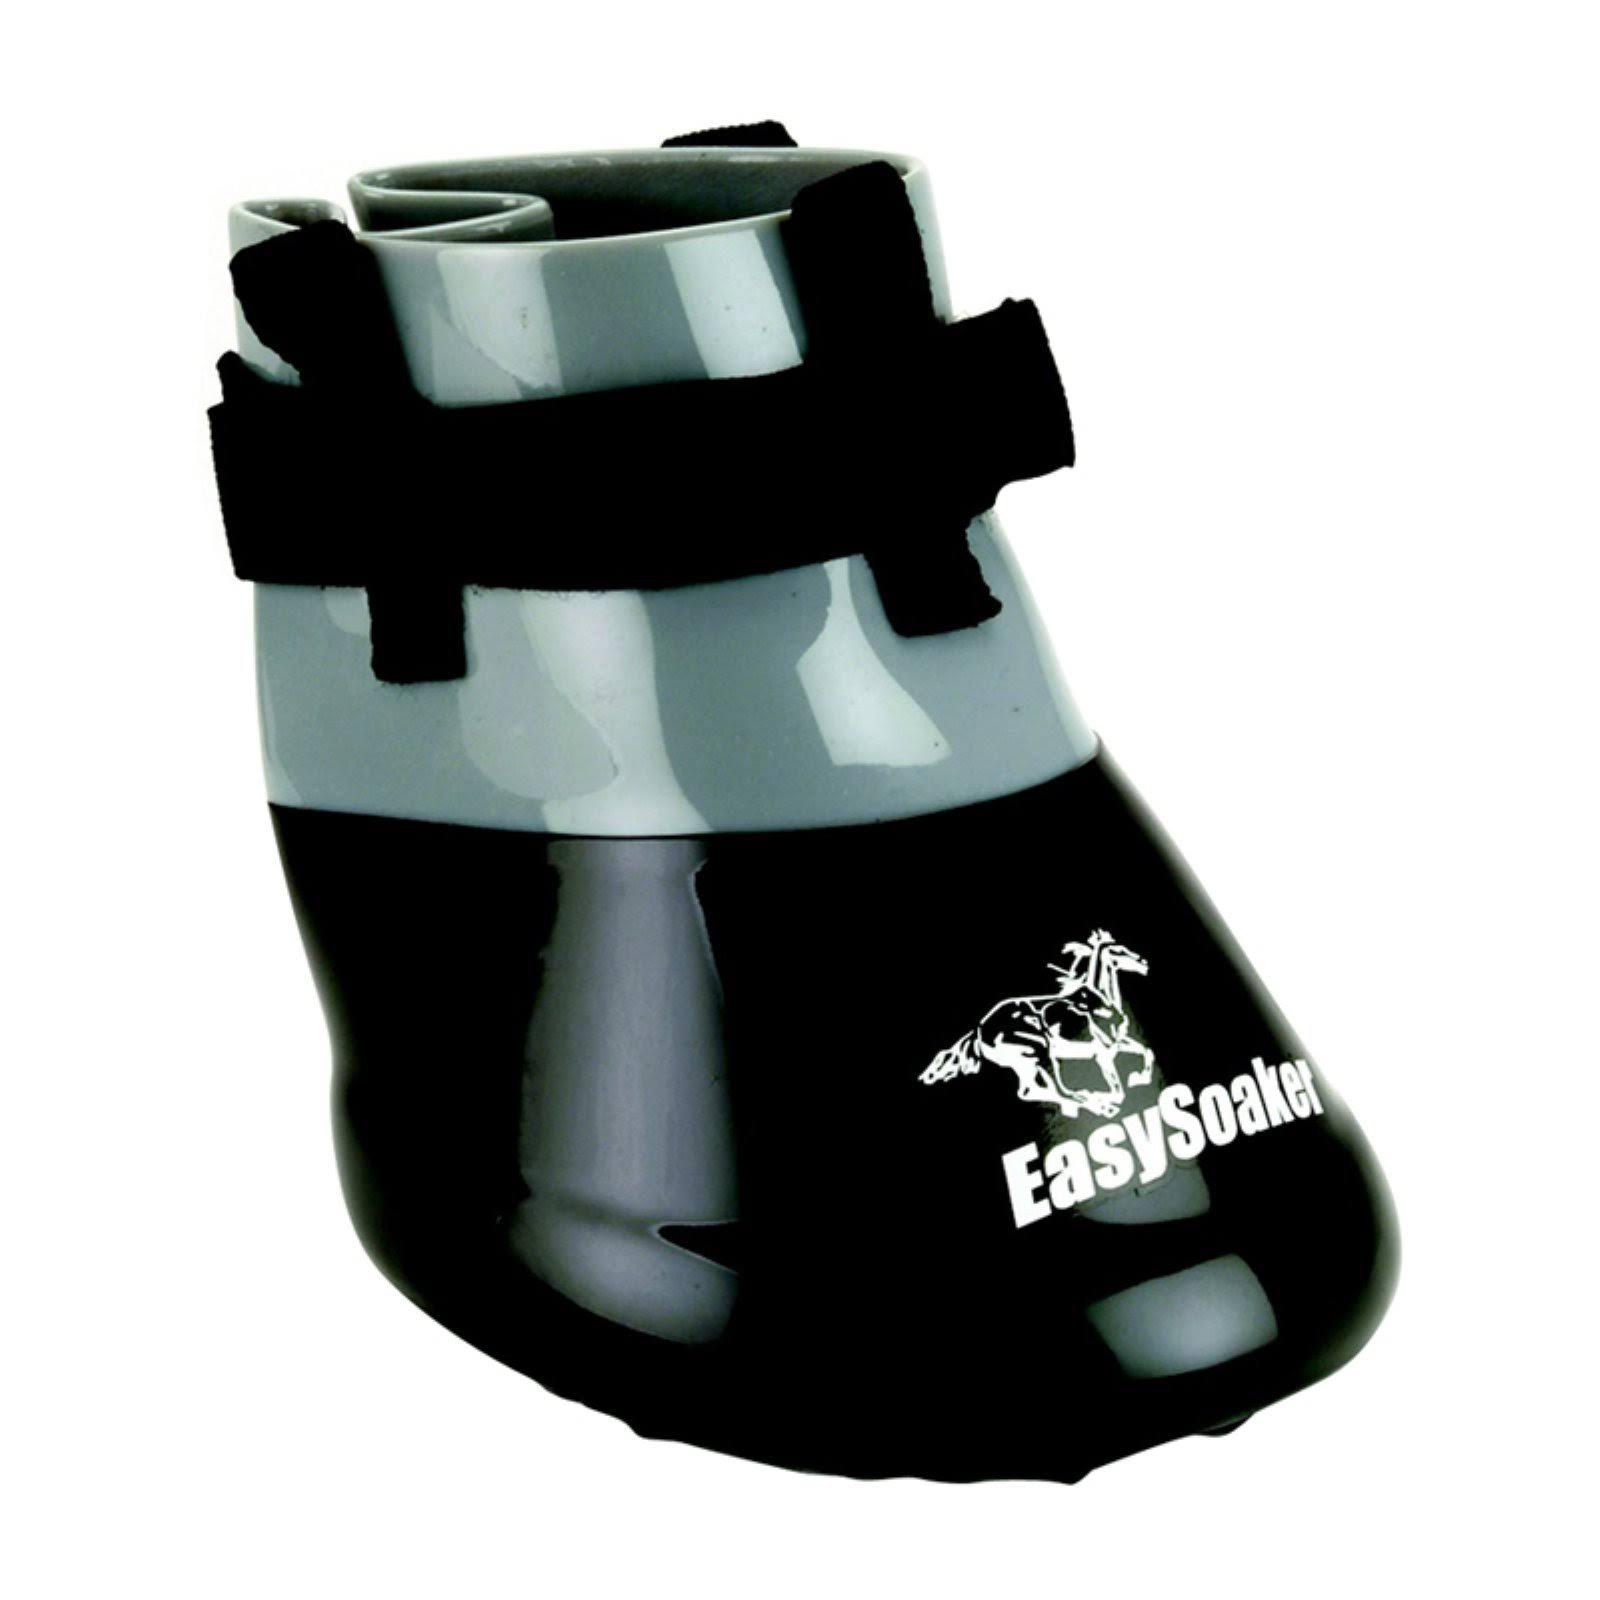 Hoof Hoof Easysoaker Boot Easysoaker Easycare Easycare Easysoaker Easycare Easysoaker Easycare Boot Boot Hoof iuXOkPTZ